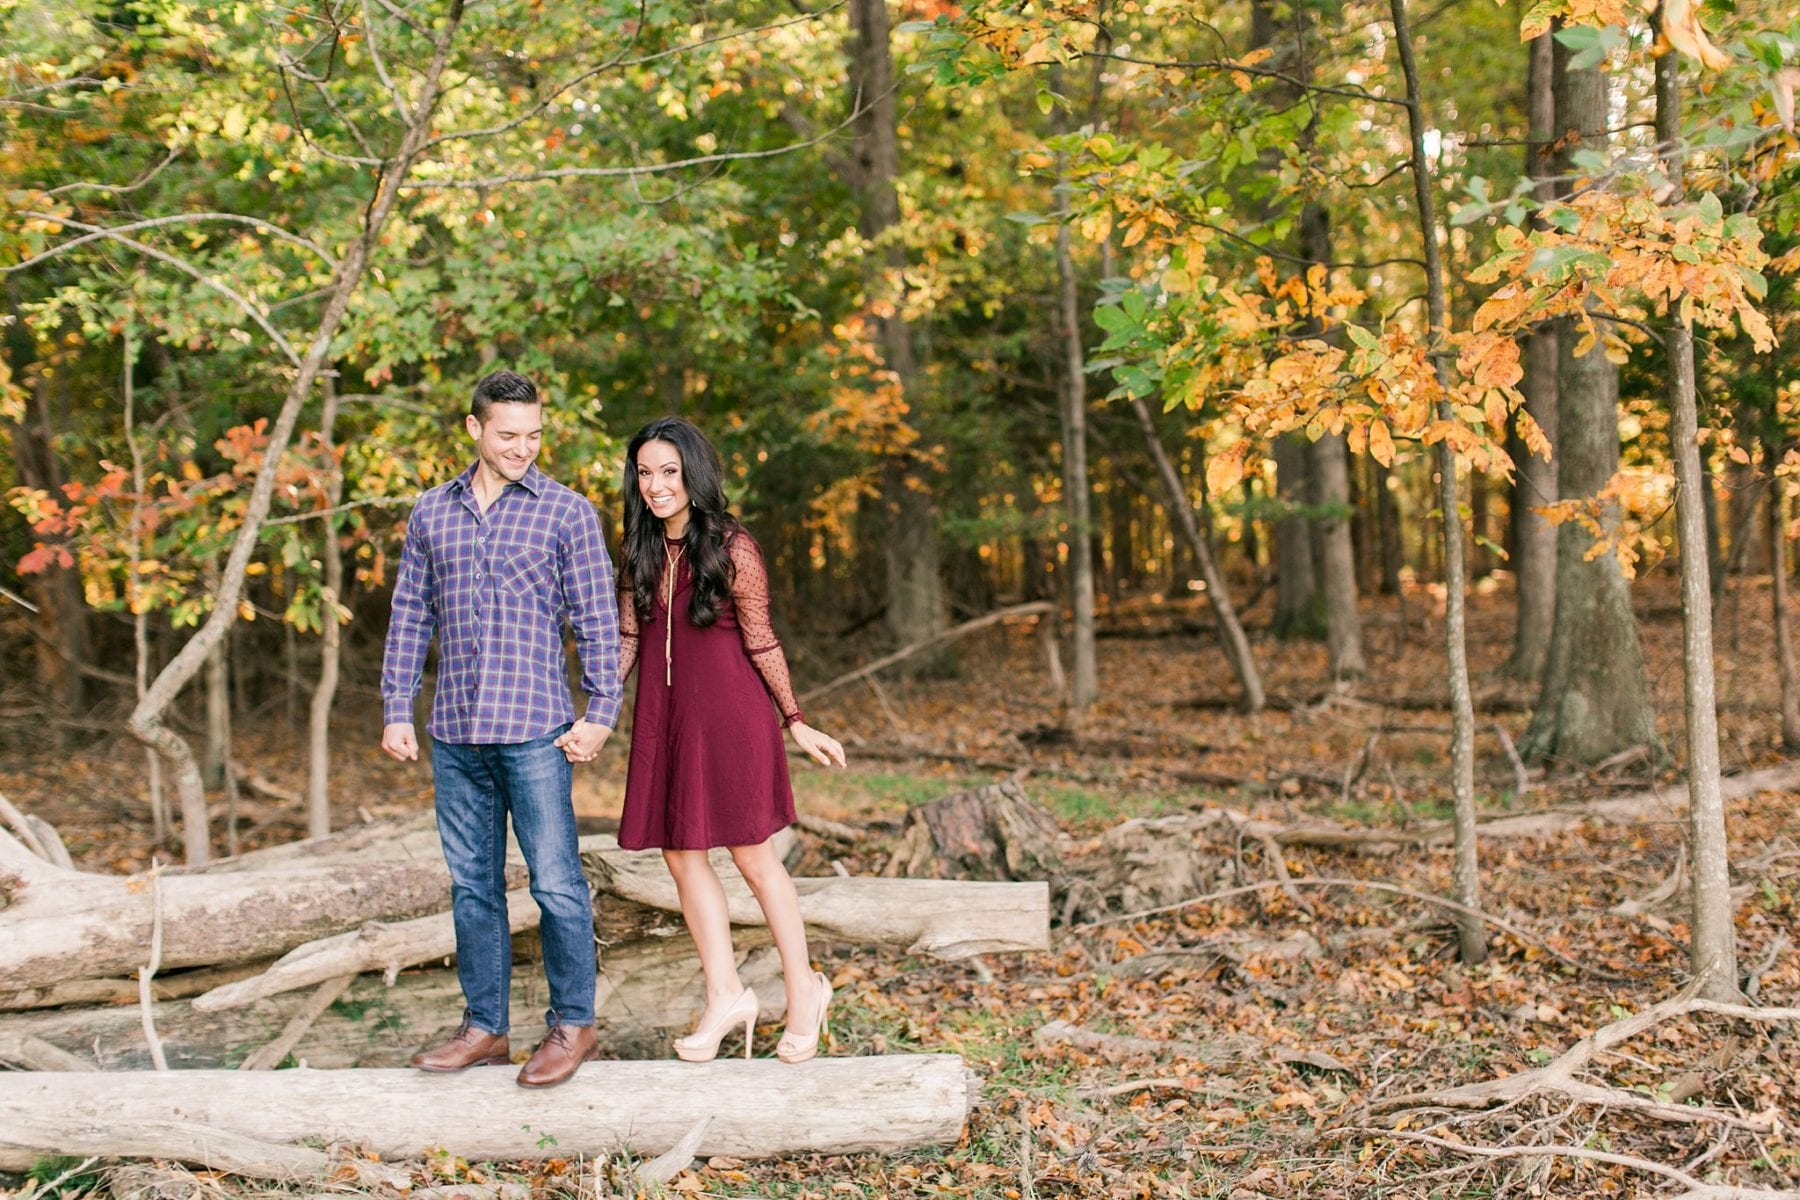 Manassas Battlefield Portraits Virginia Wedding Photographer Megan Kelsey Photography Lianne & Chris-45.jpg